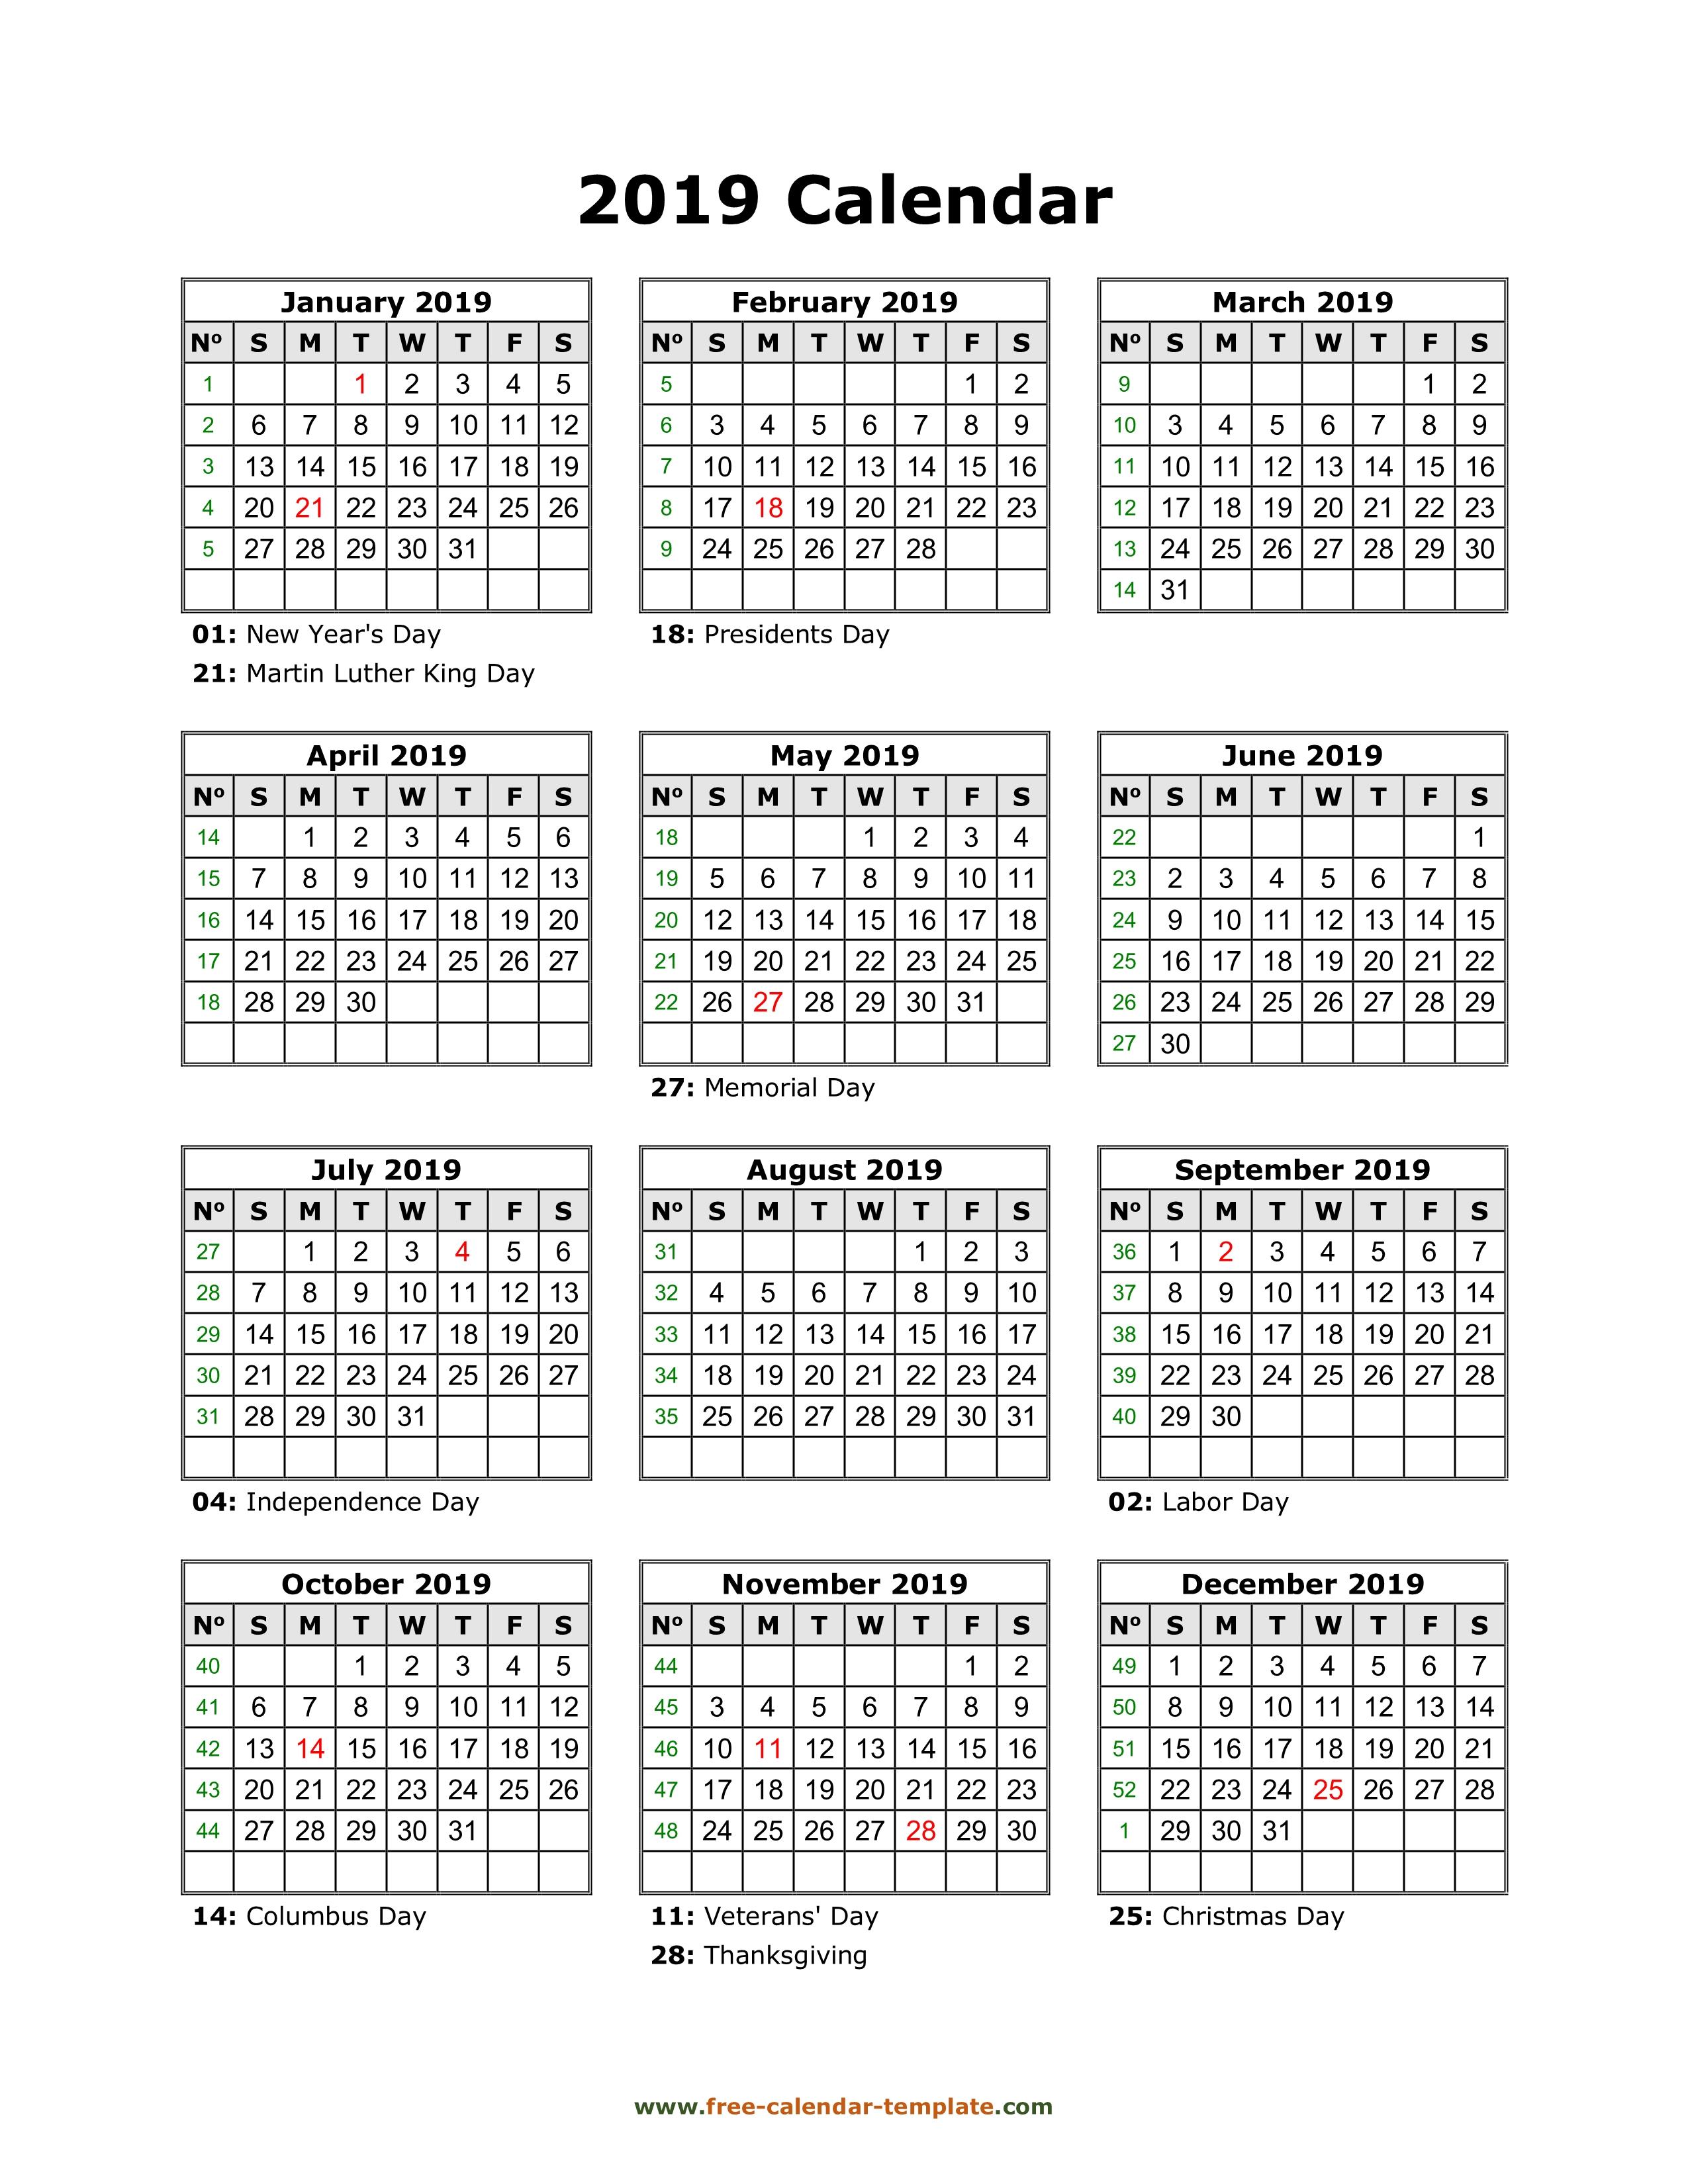 Yearly Printable Calendar 2019 With Holidays | Free-Calendar